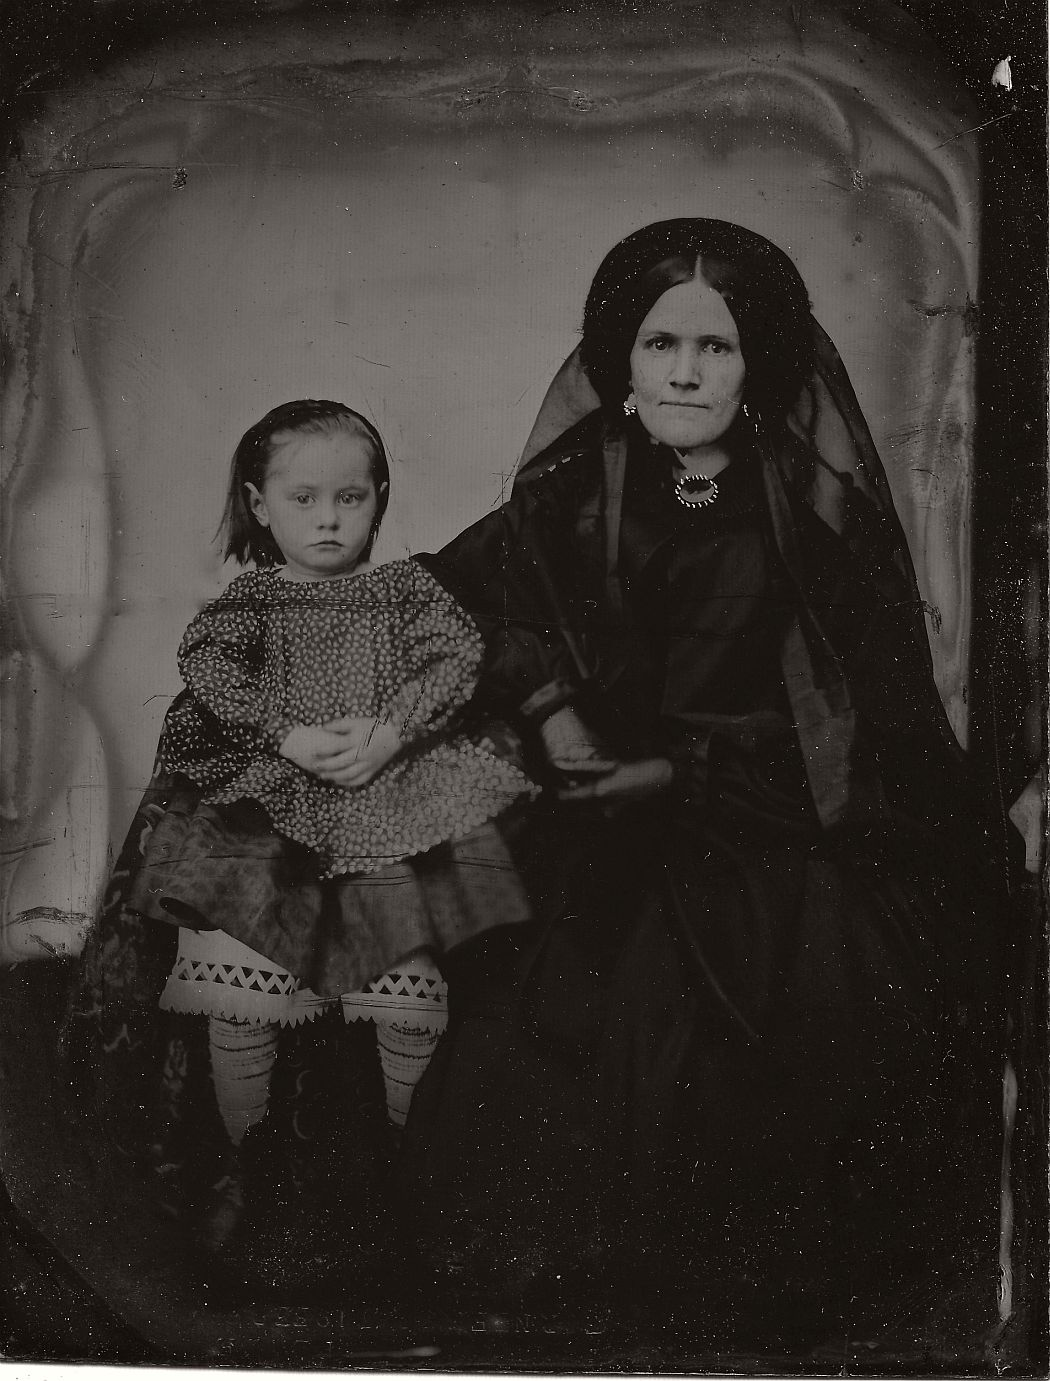 vintage-daguerreotypes-of-widows-in-mourning-victorian-era-1800s-06